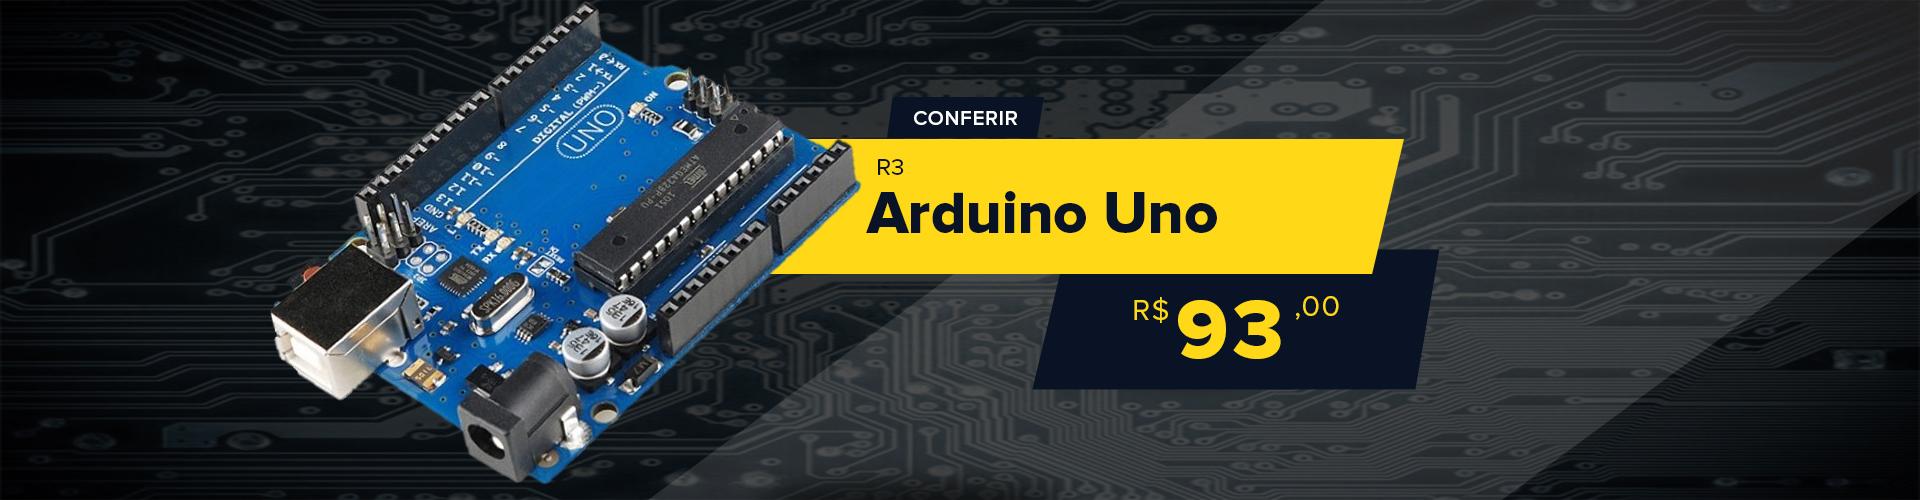 Full Banner 4 Arduino Uno